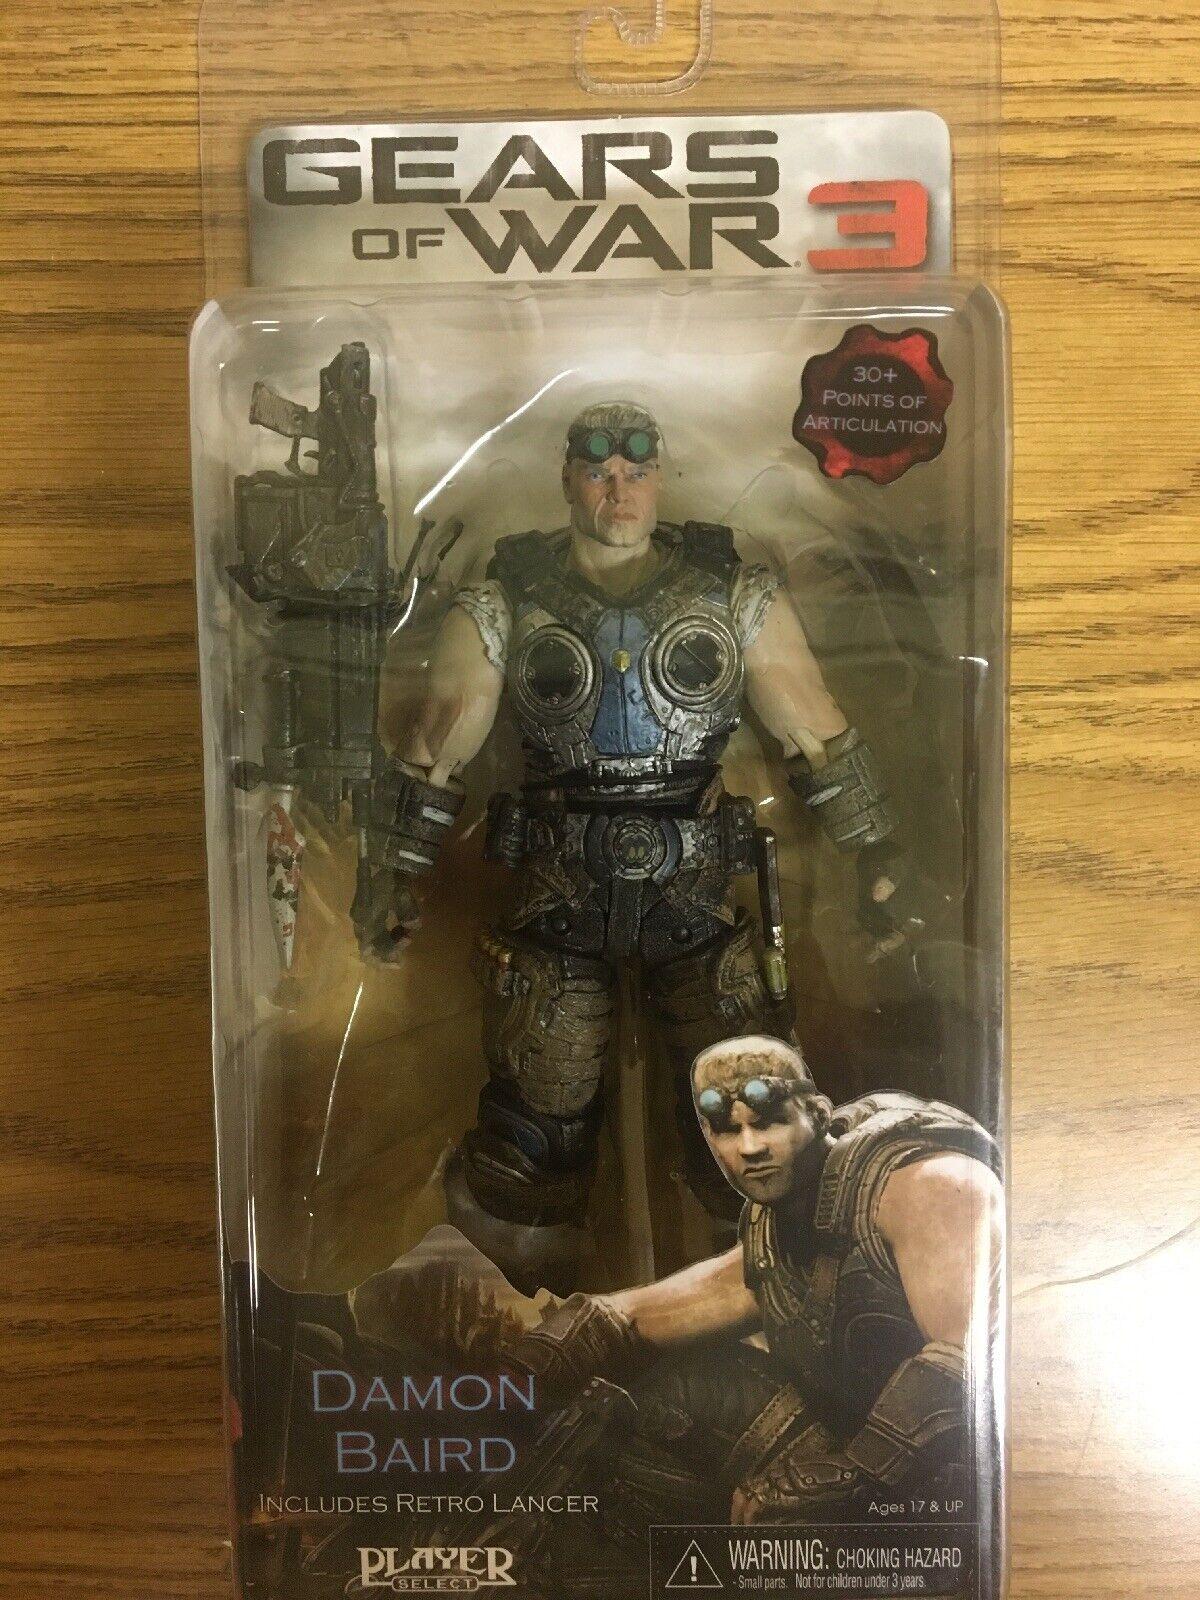 Damon Baird-Gears of War 3 -7  pulgadas figura de acción 30+ puntos de articulación